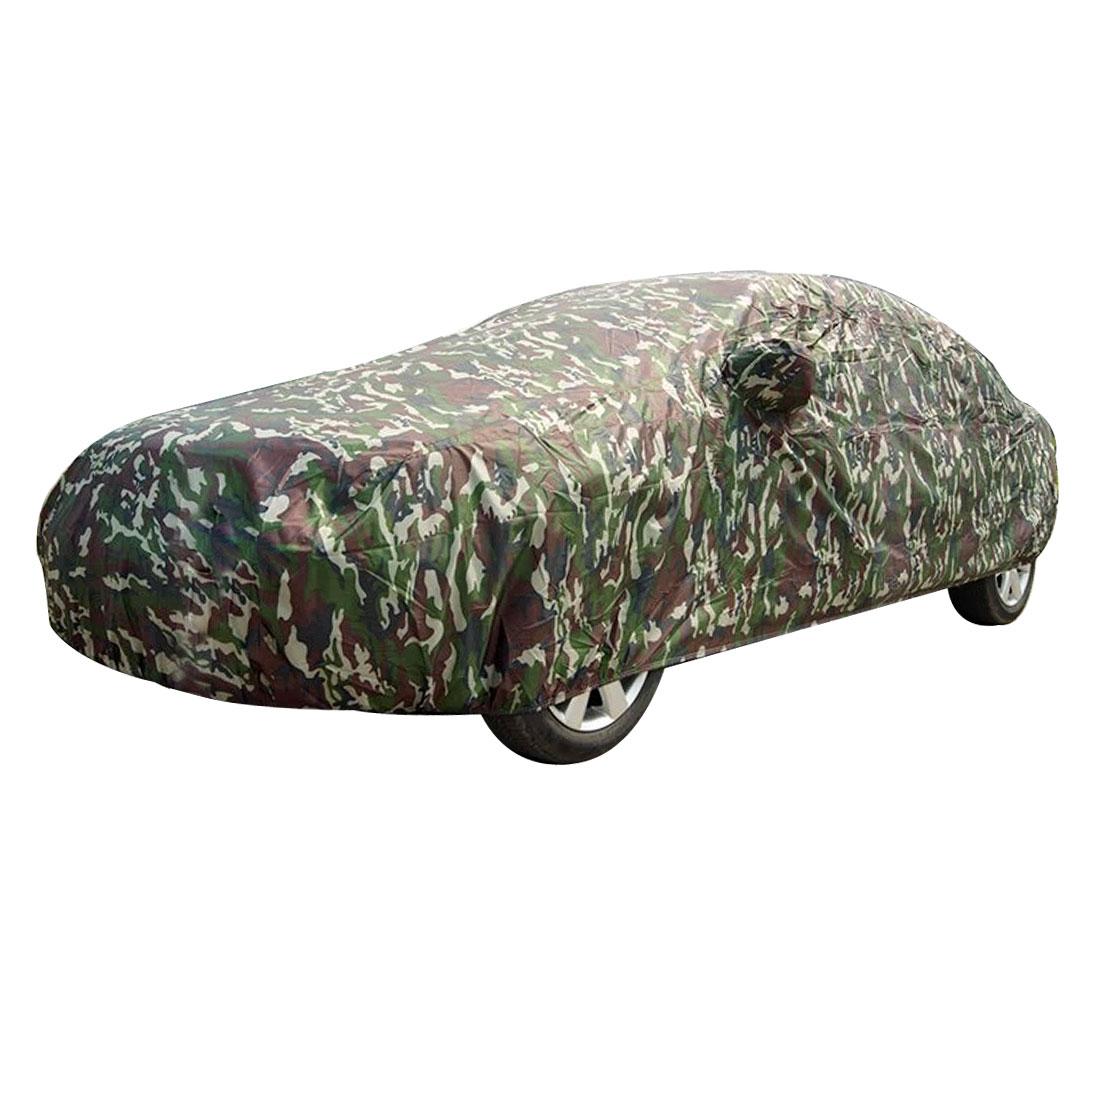 Vehicles Car Plastic Camouflage Pattern Snowbreak Cover L